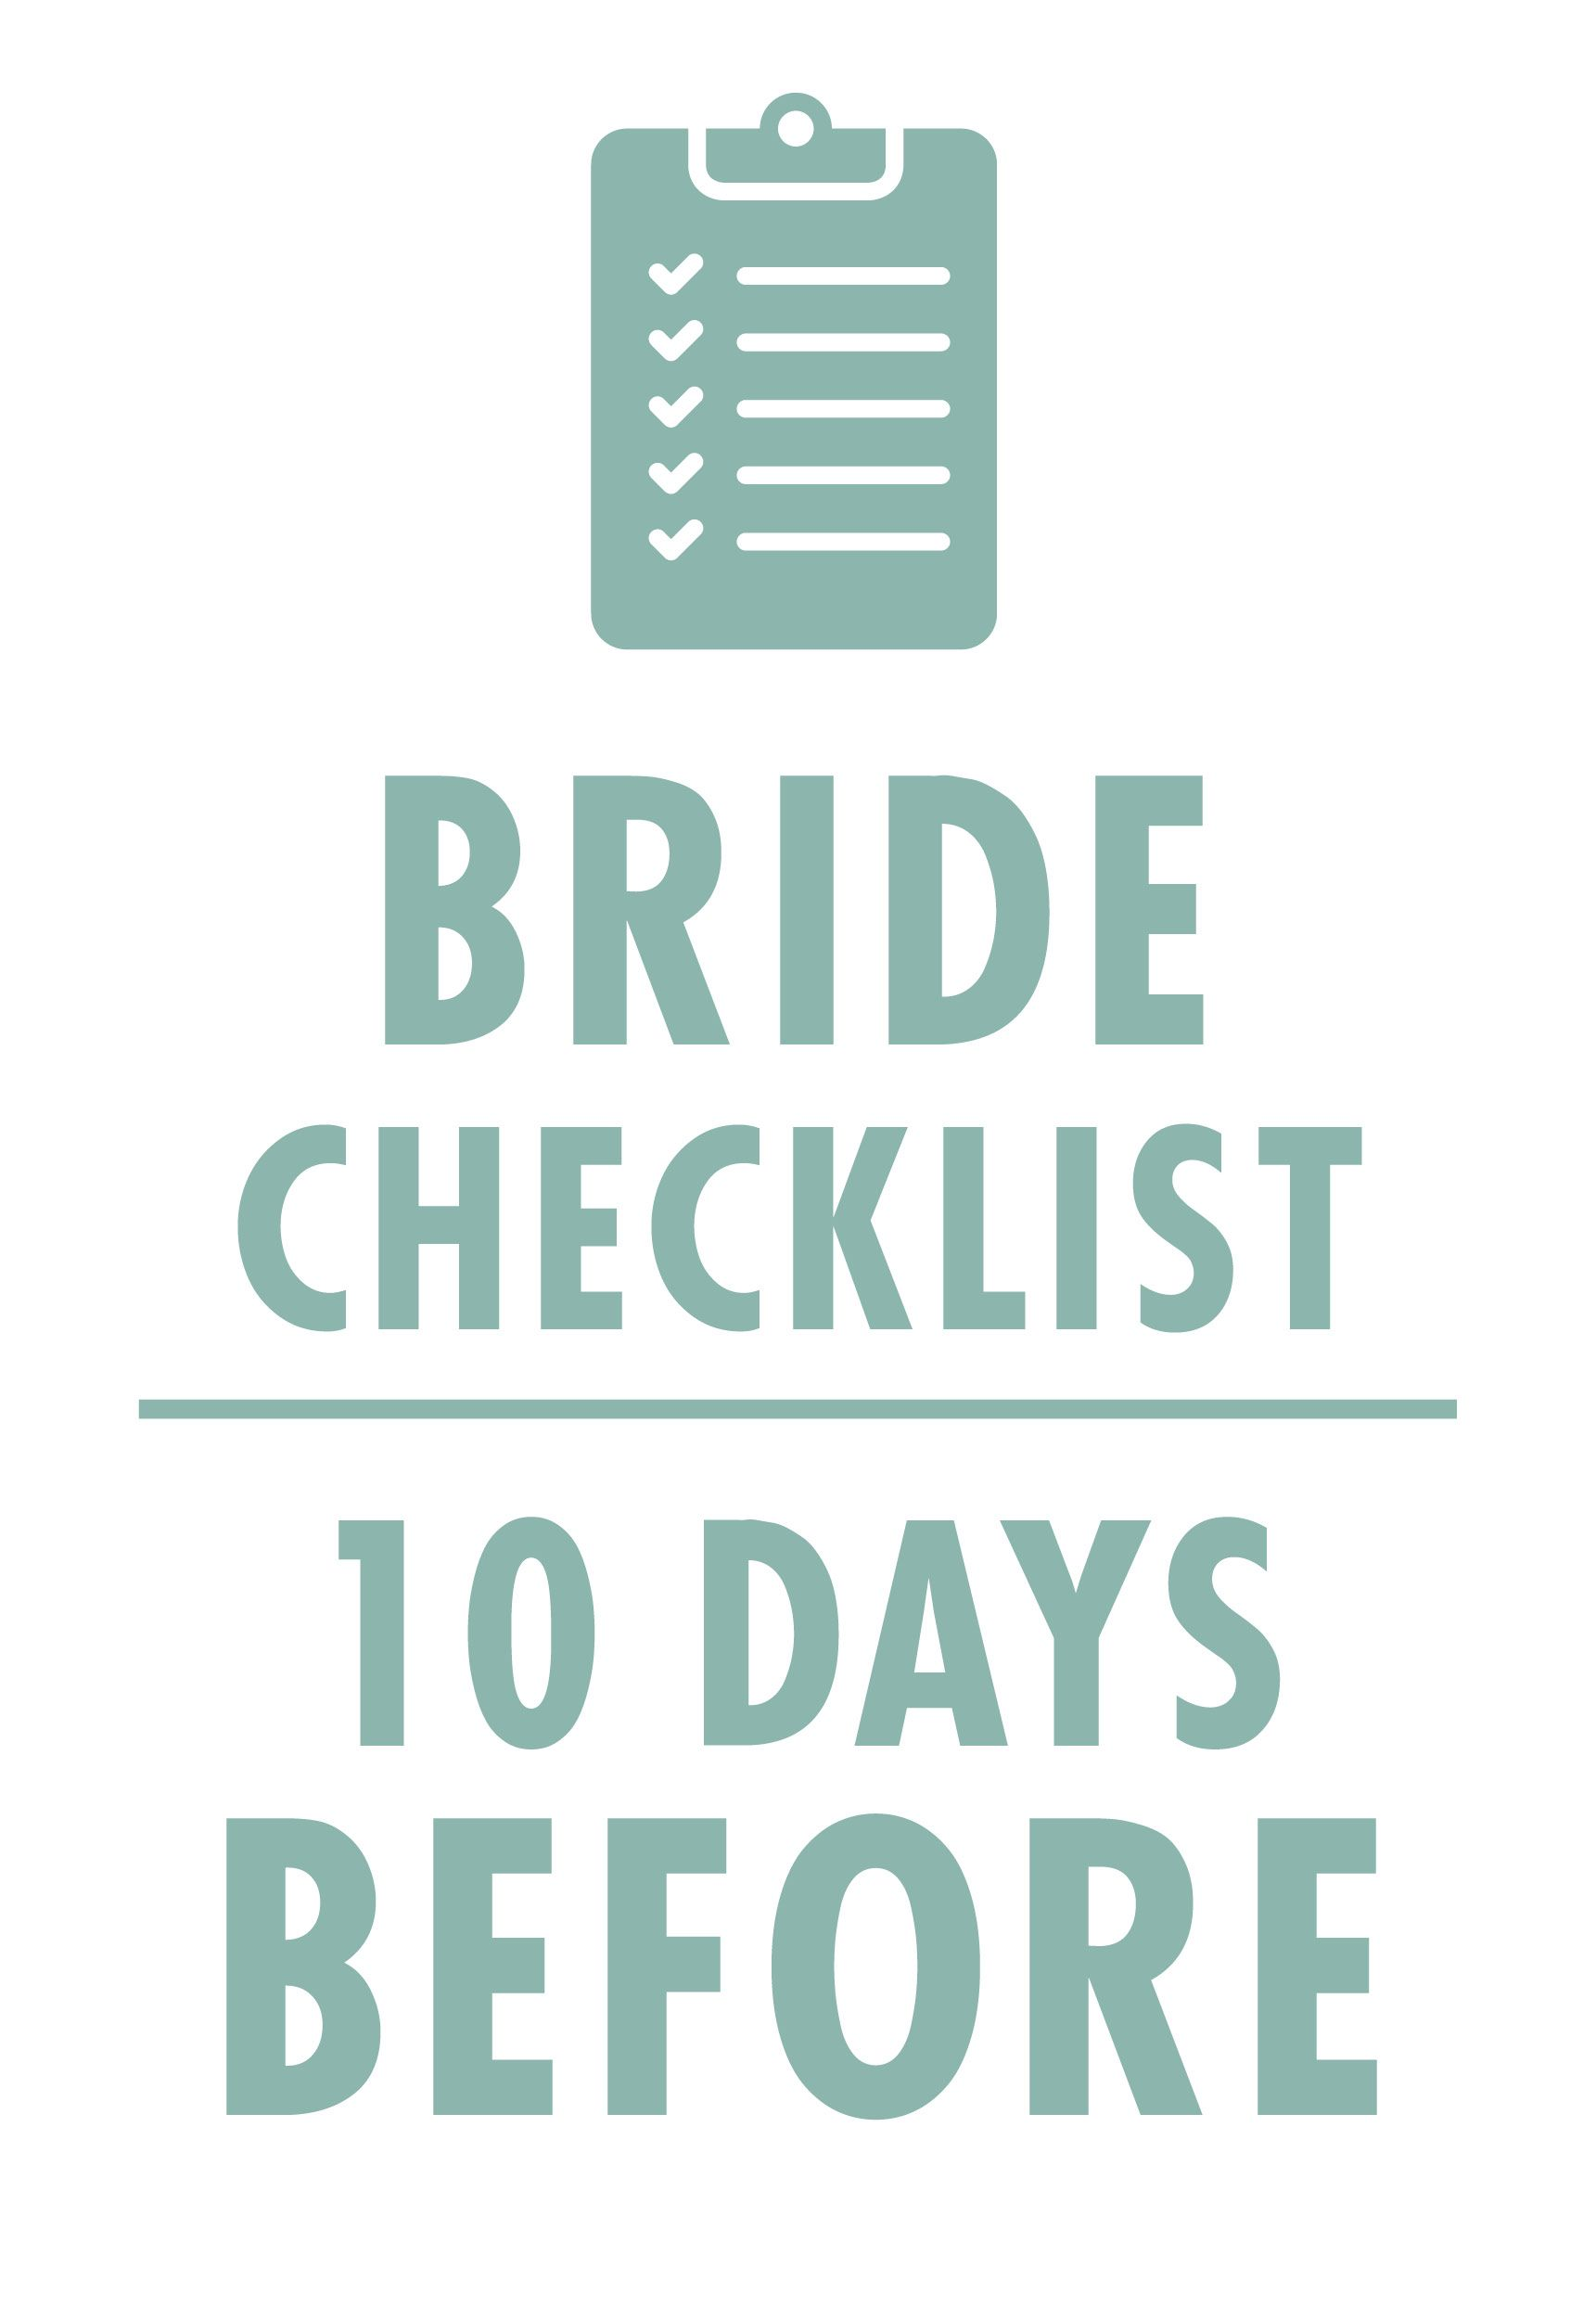 Week Before Wedding Checklist Wedding To Do List Wedding To Do List Wedding Checklist Bride Checklist